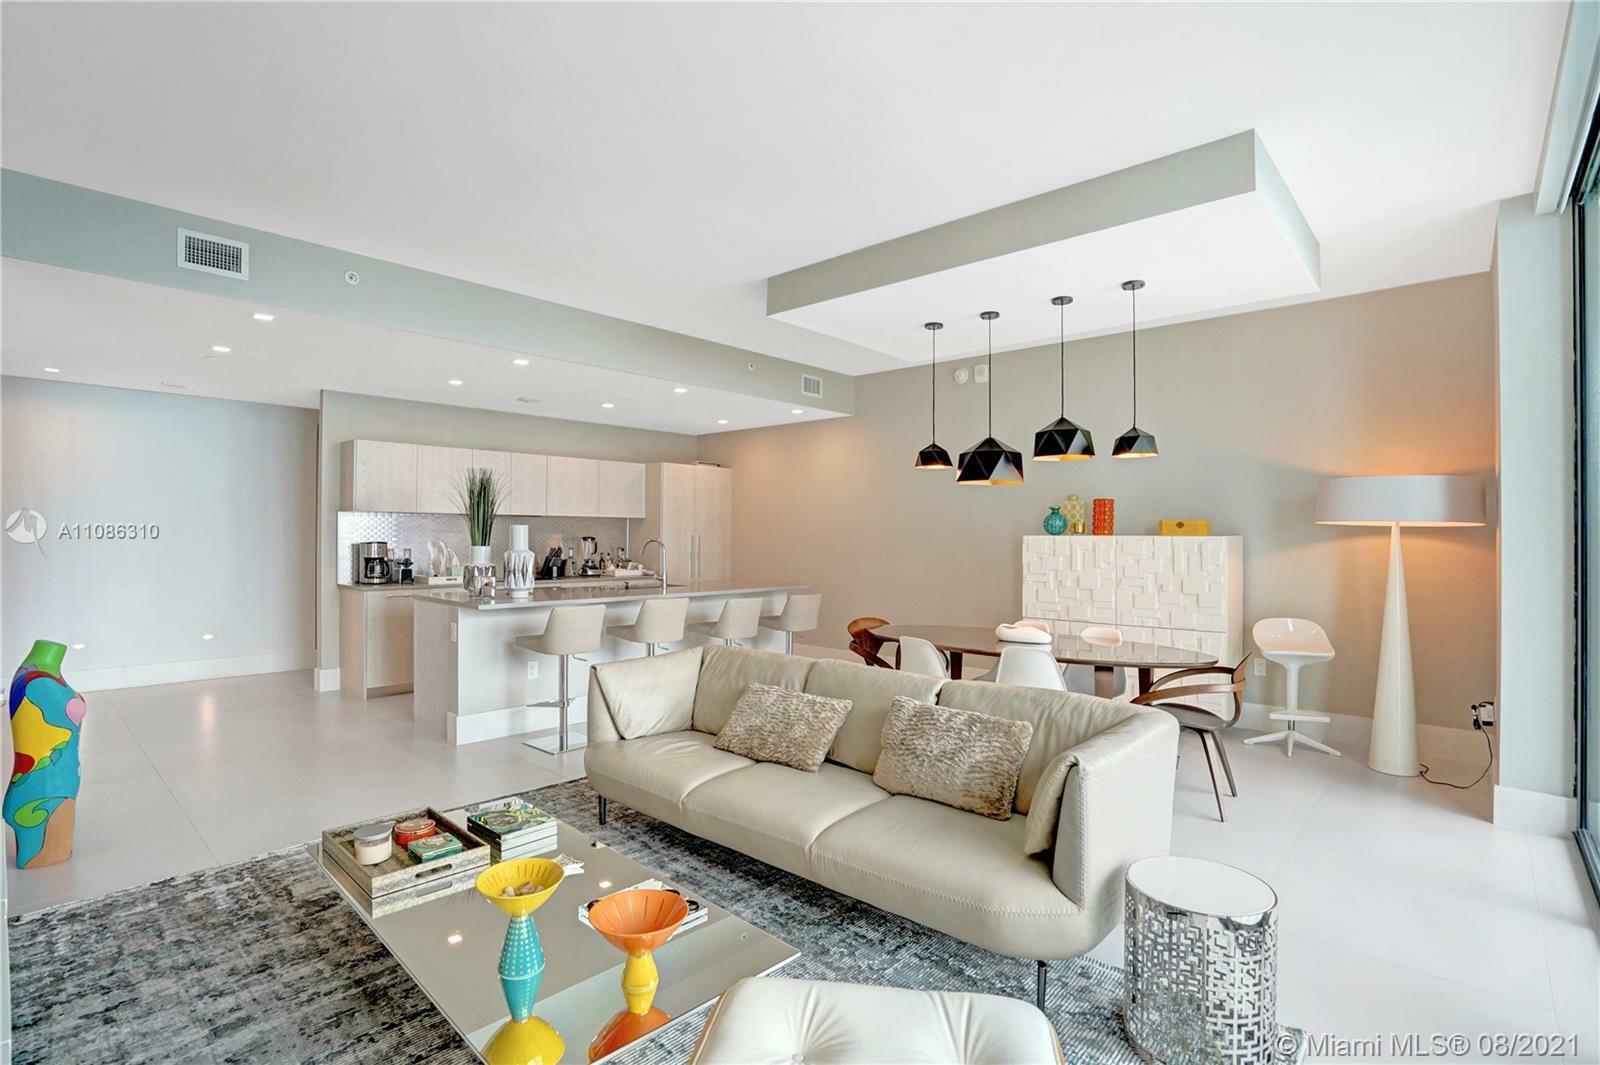 Apartment for Rent in Miami